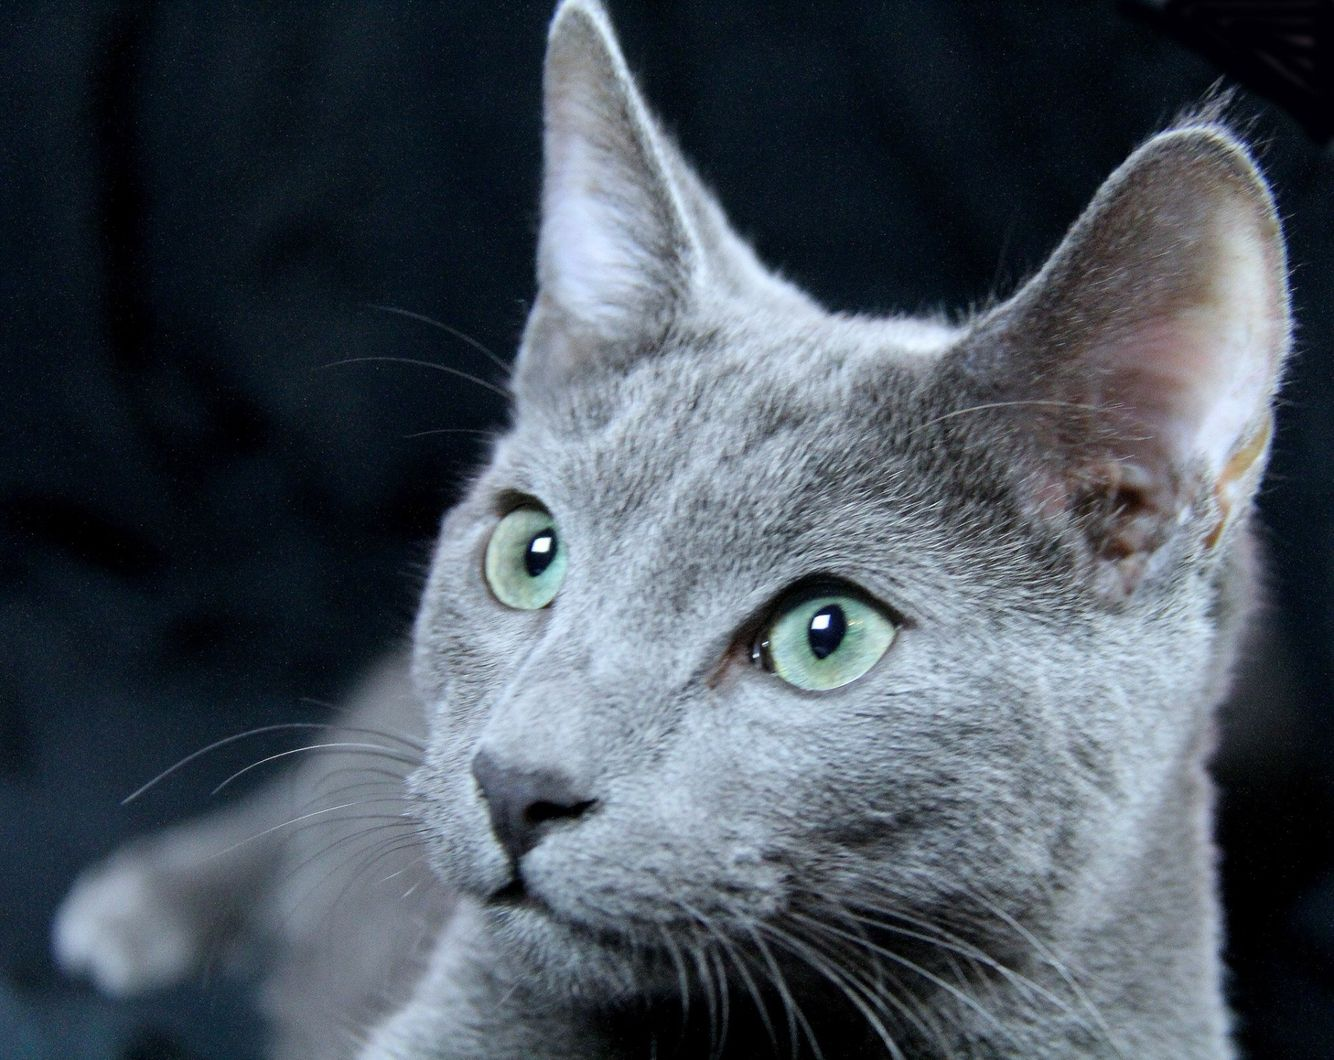 Artus Russischblau Russianblue Katzen Cats Russian Blue Russian Blue Kitten Russian Blue Cat